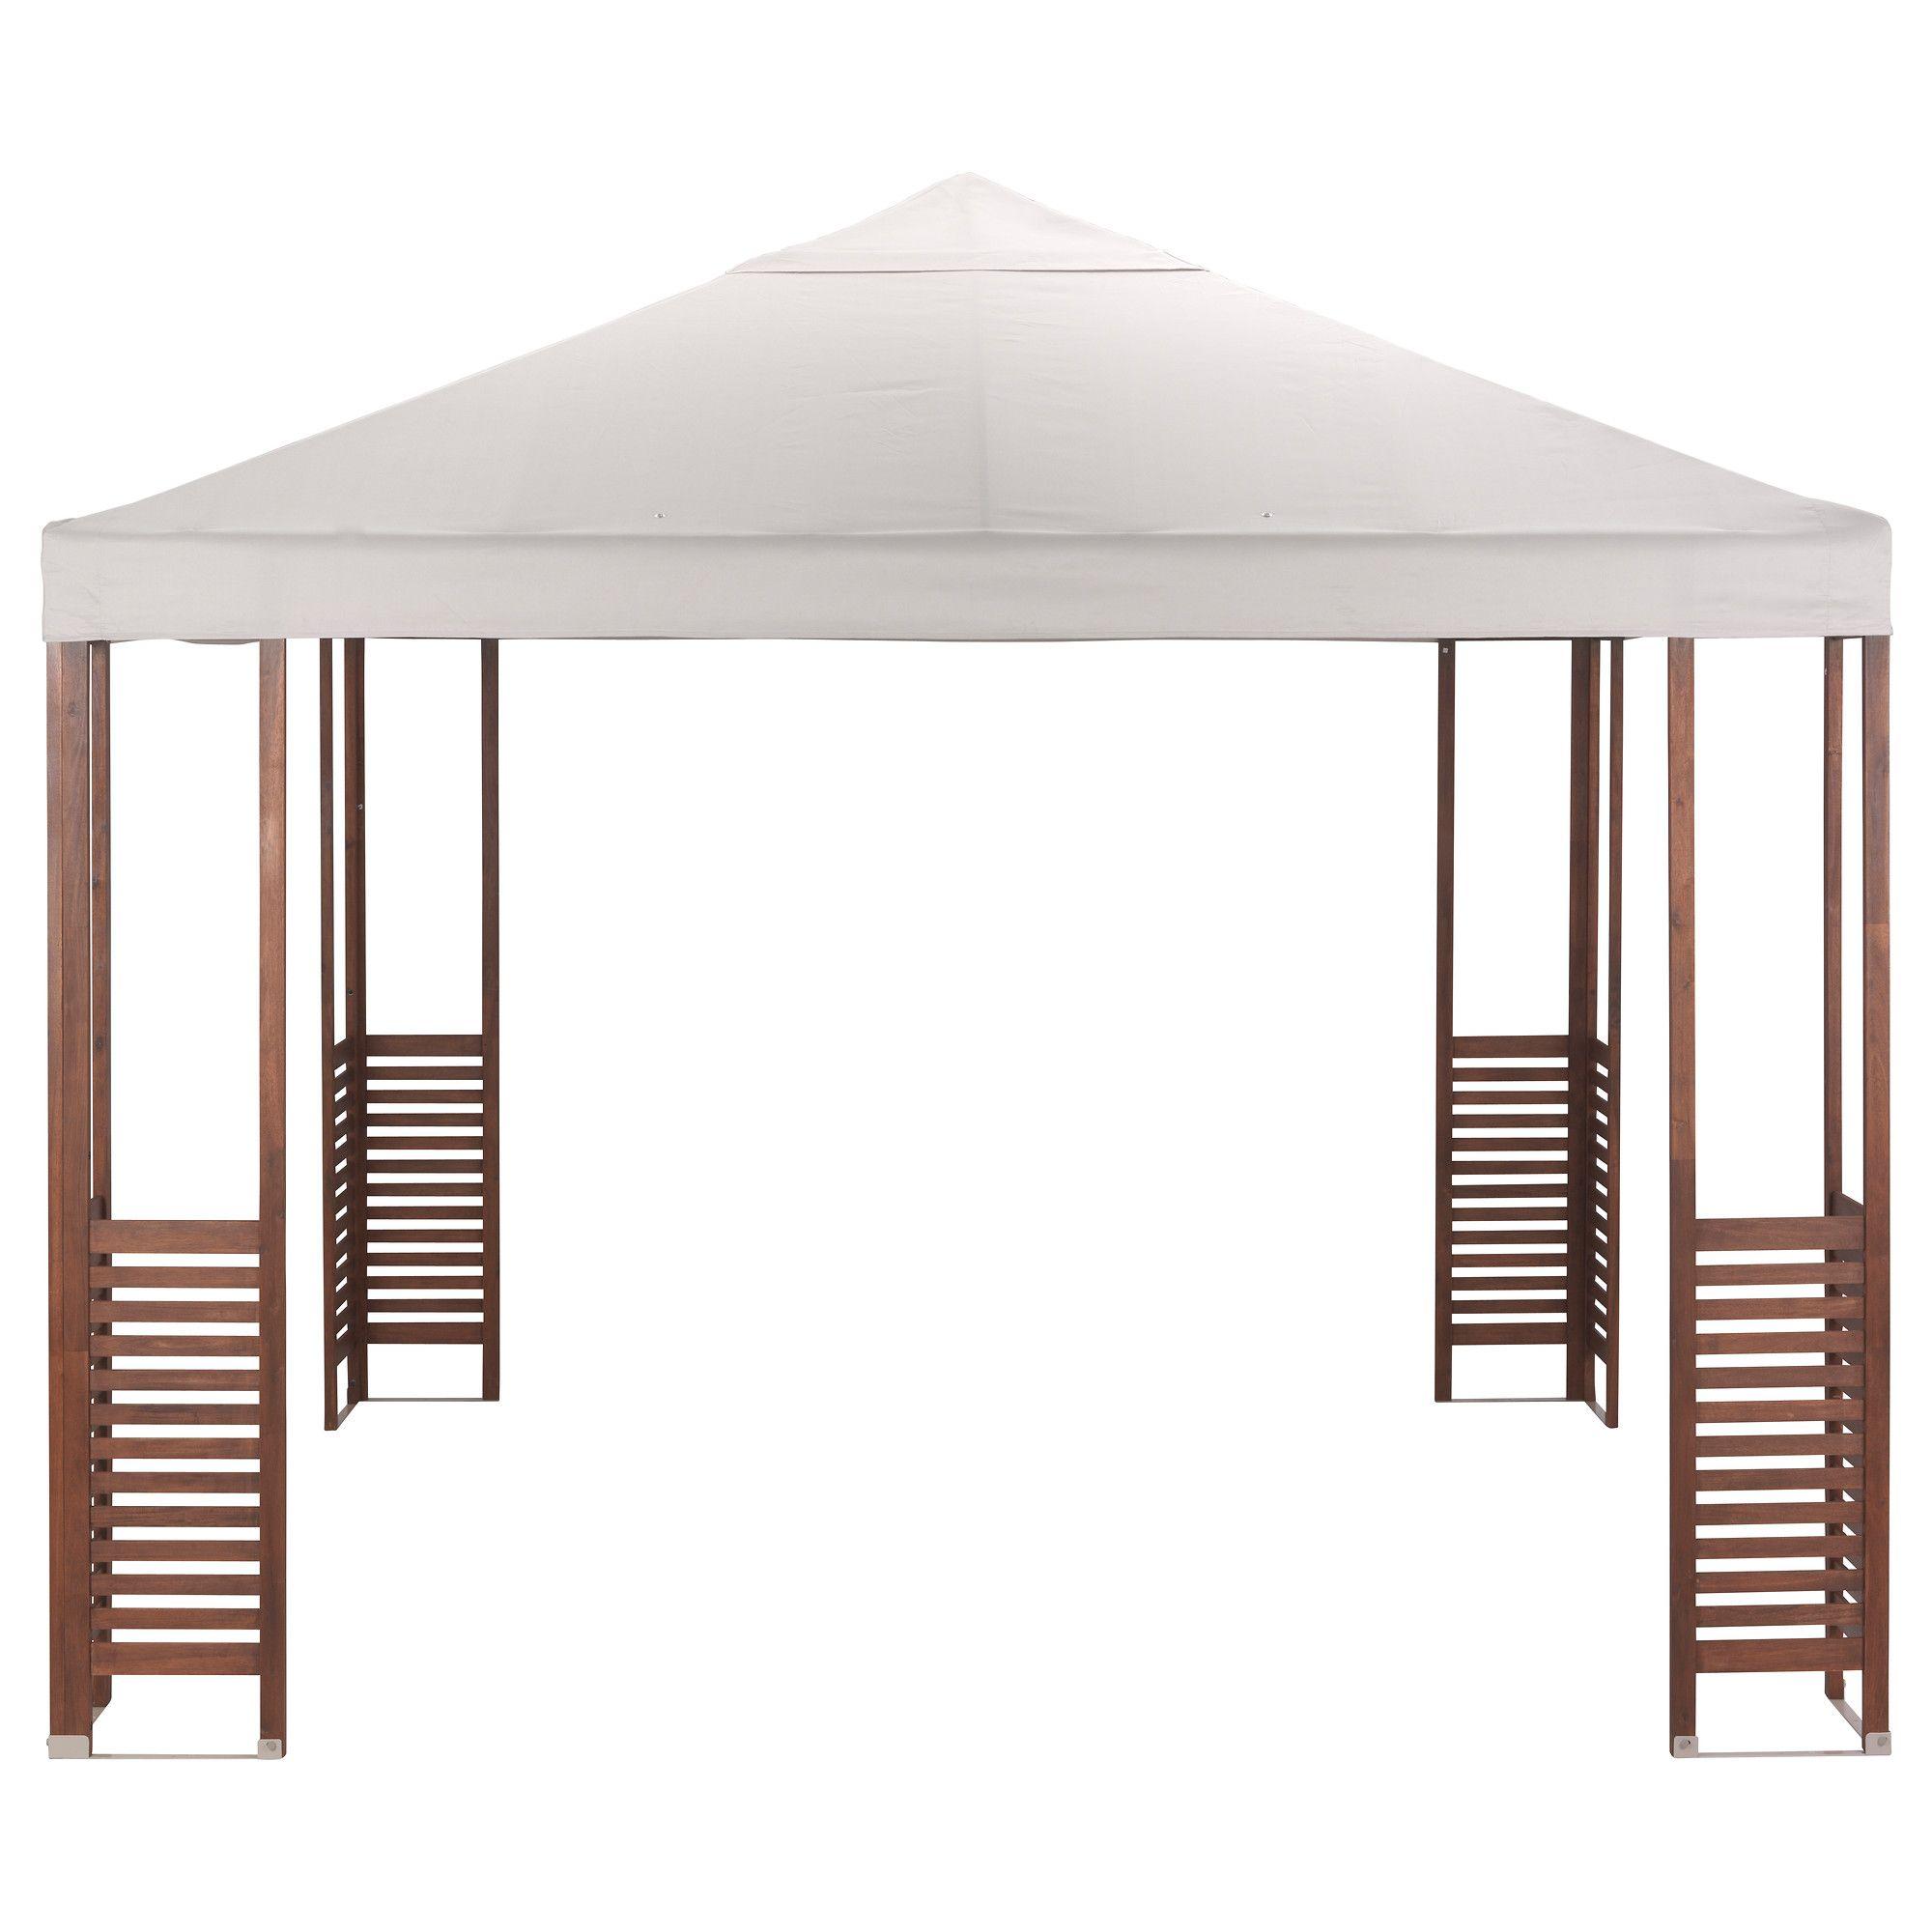 Shop For Furniture Home Accessories More Gazebo Ikea Ikea Applaro